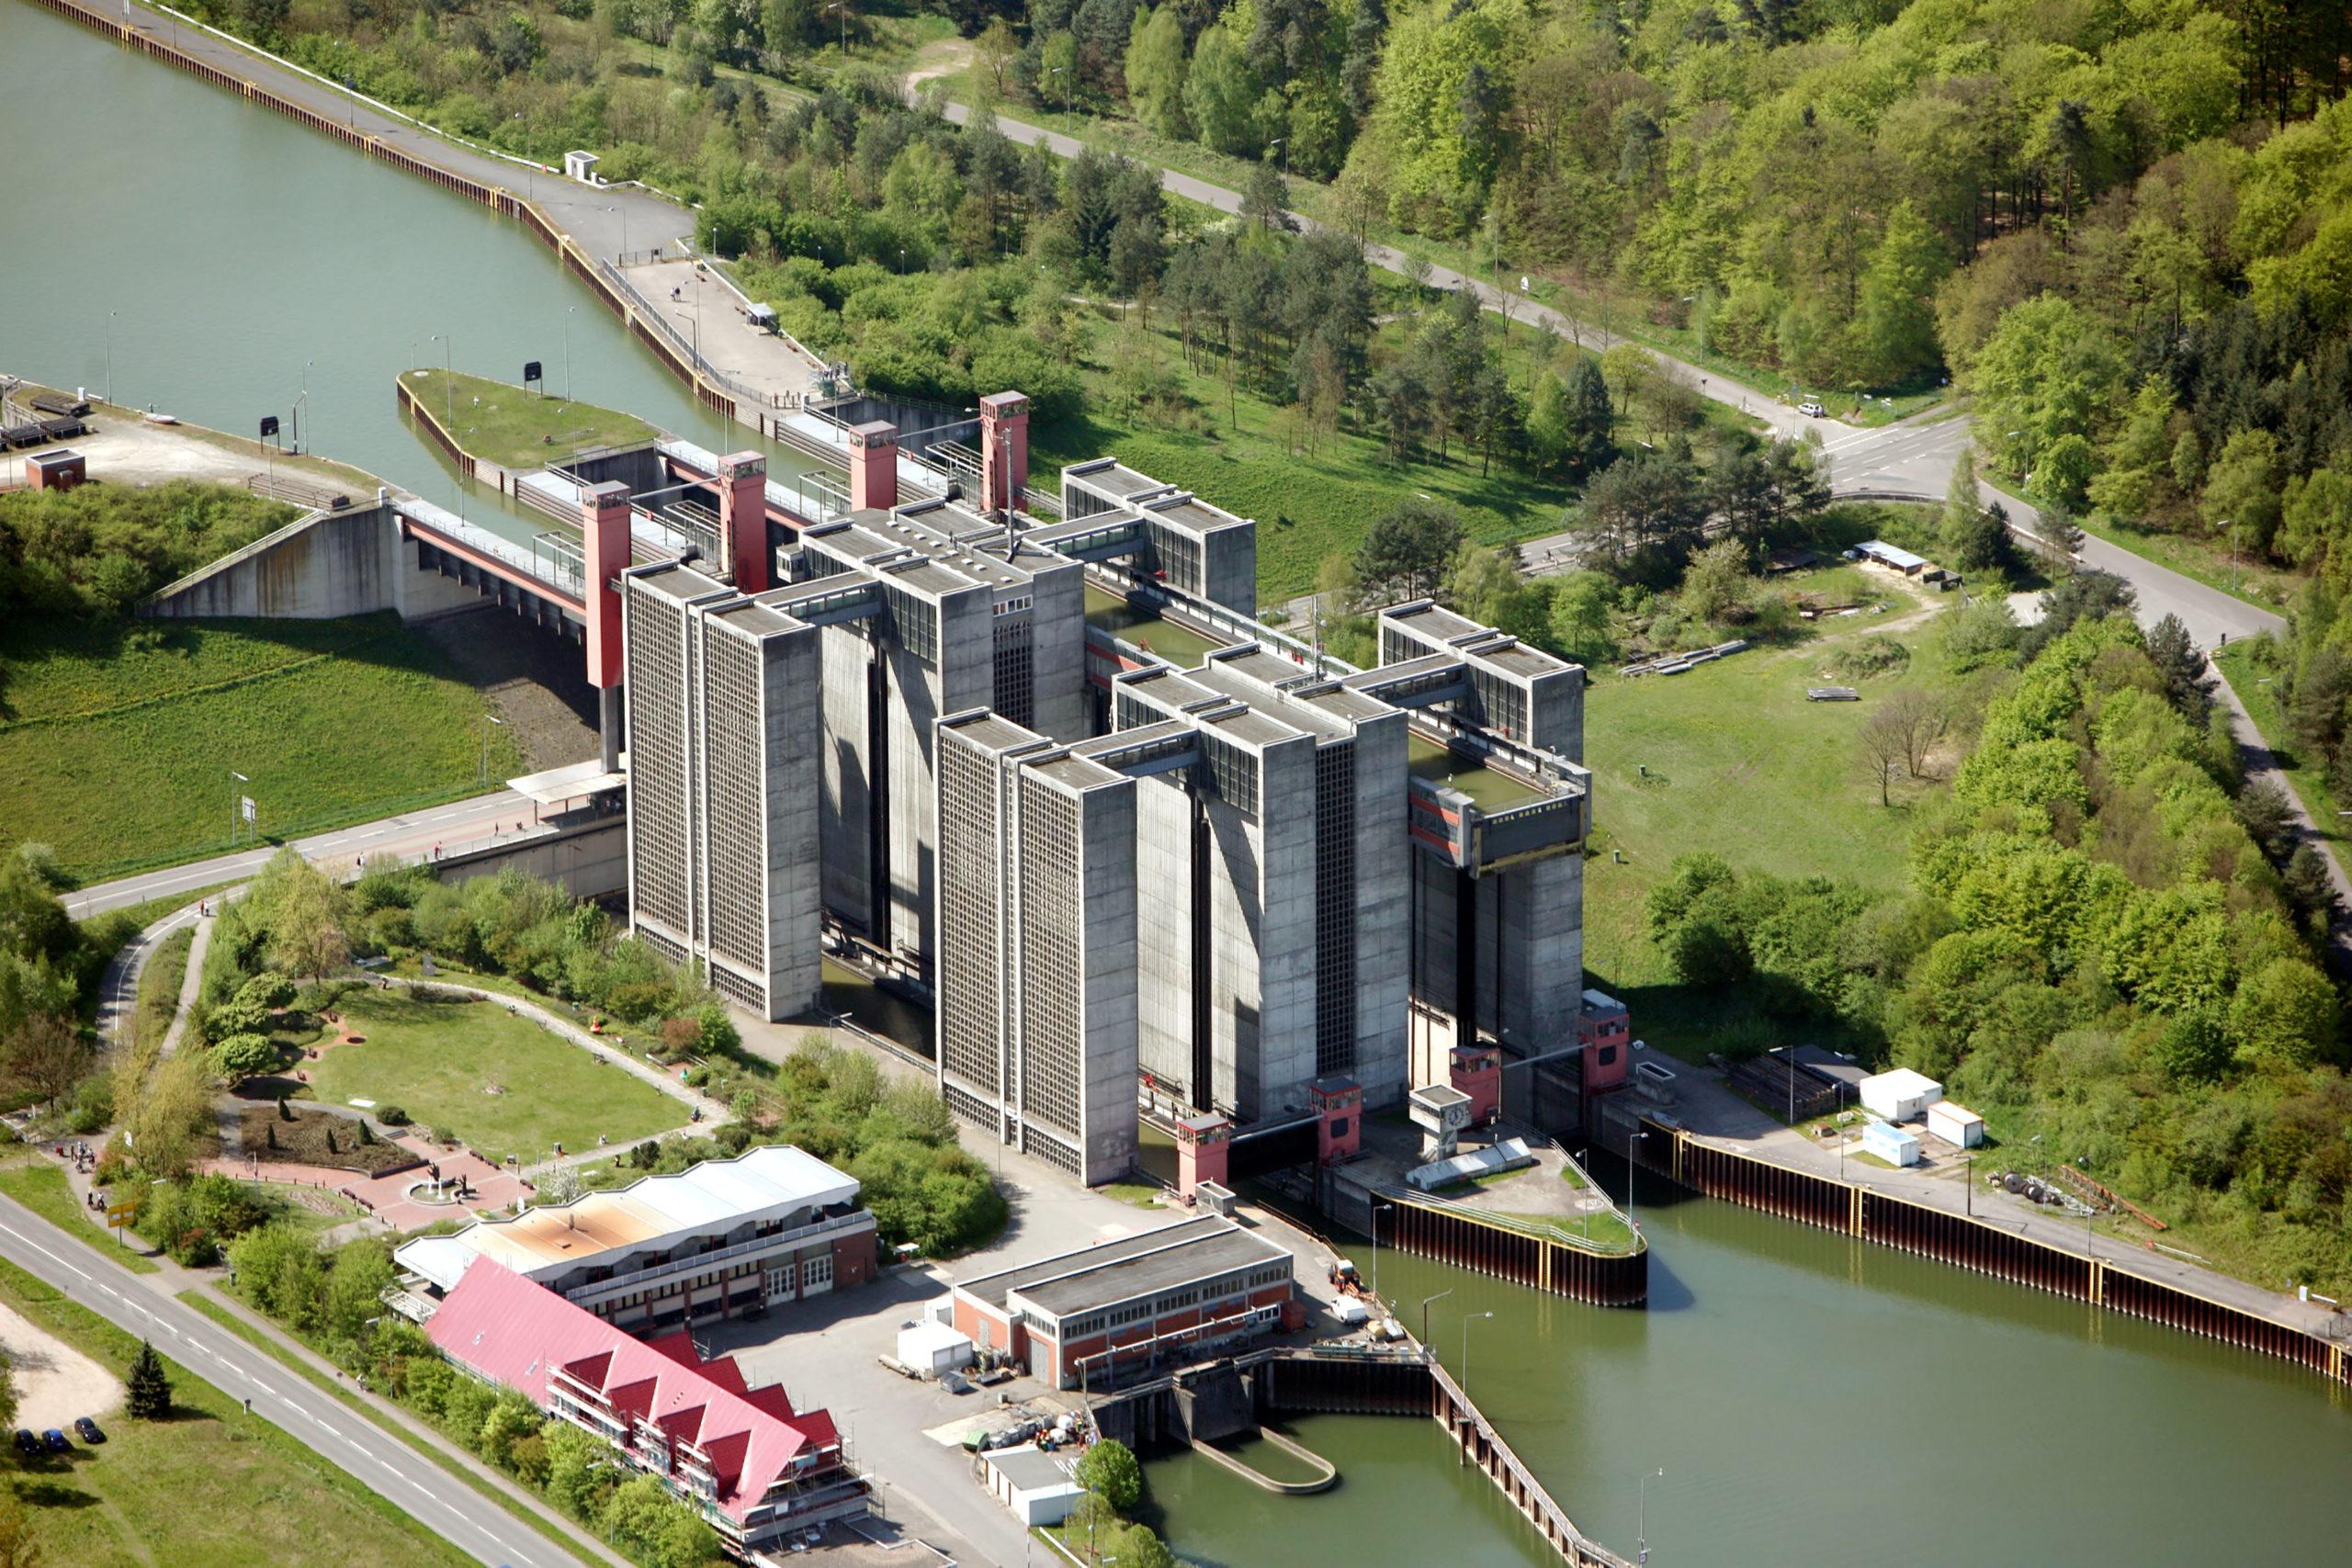 Abenteuer am Elbeufer